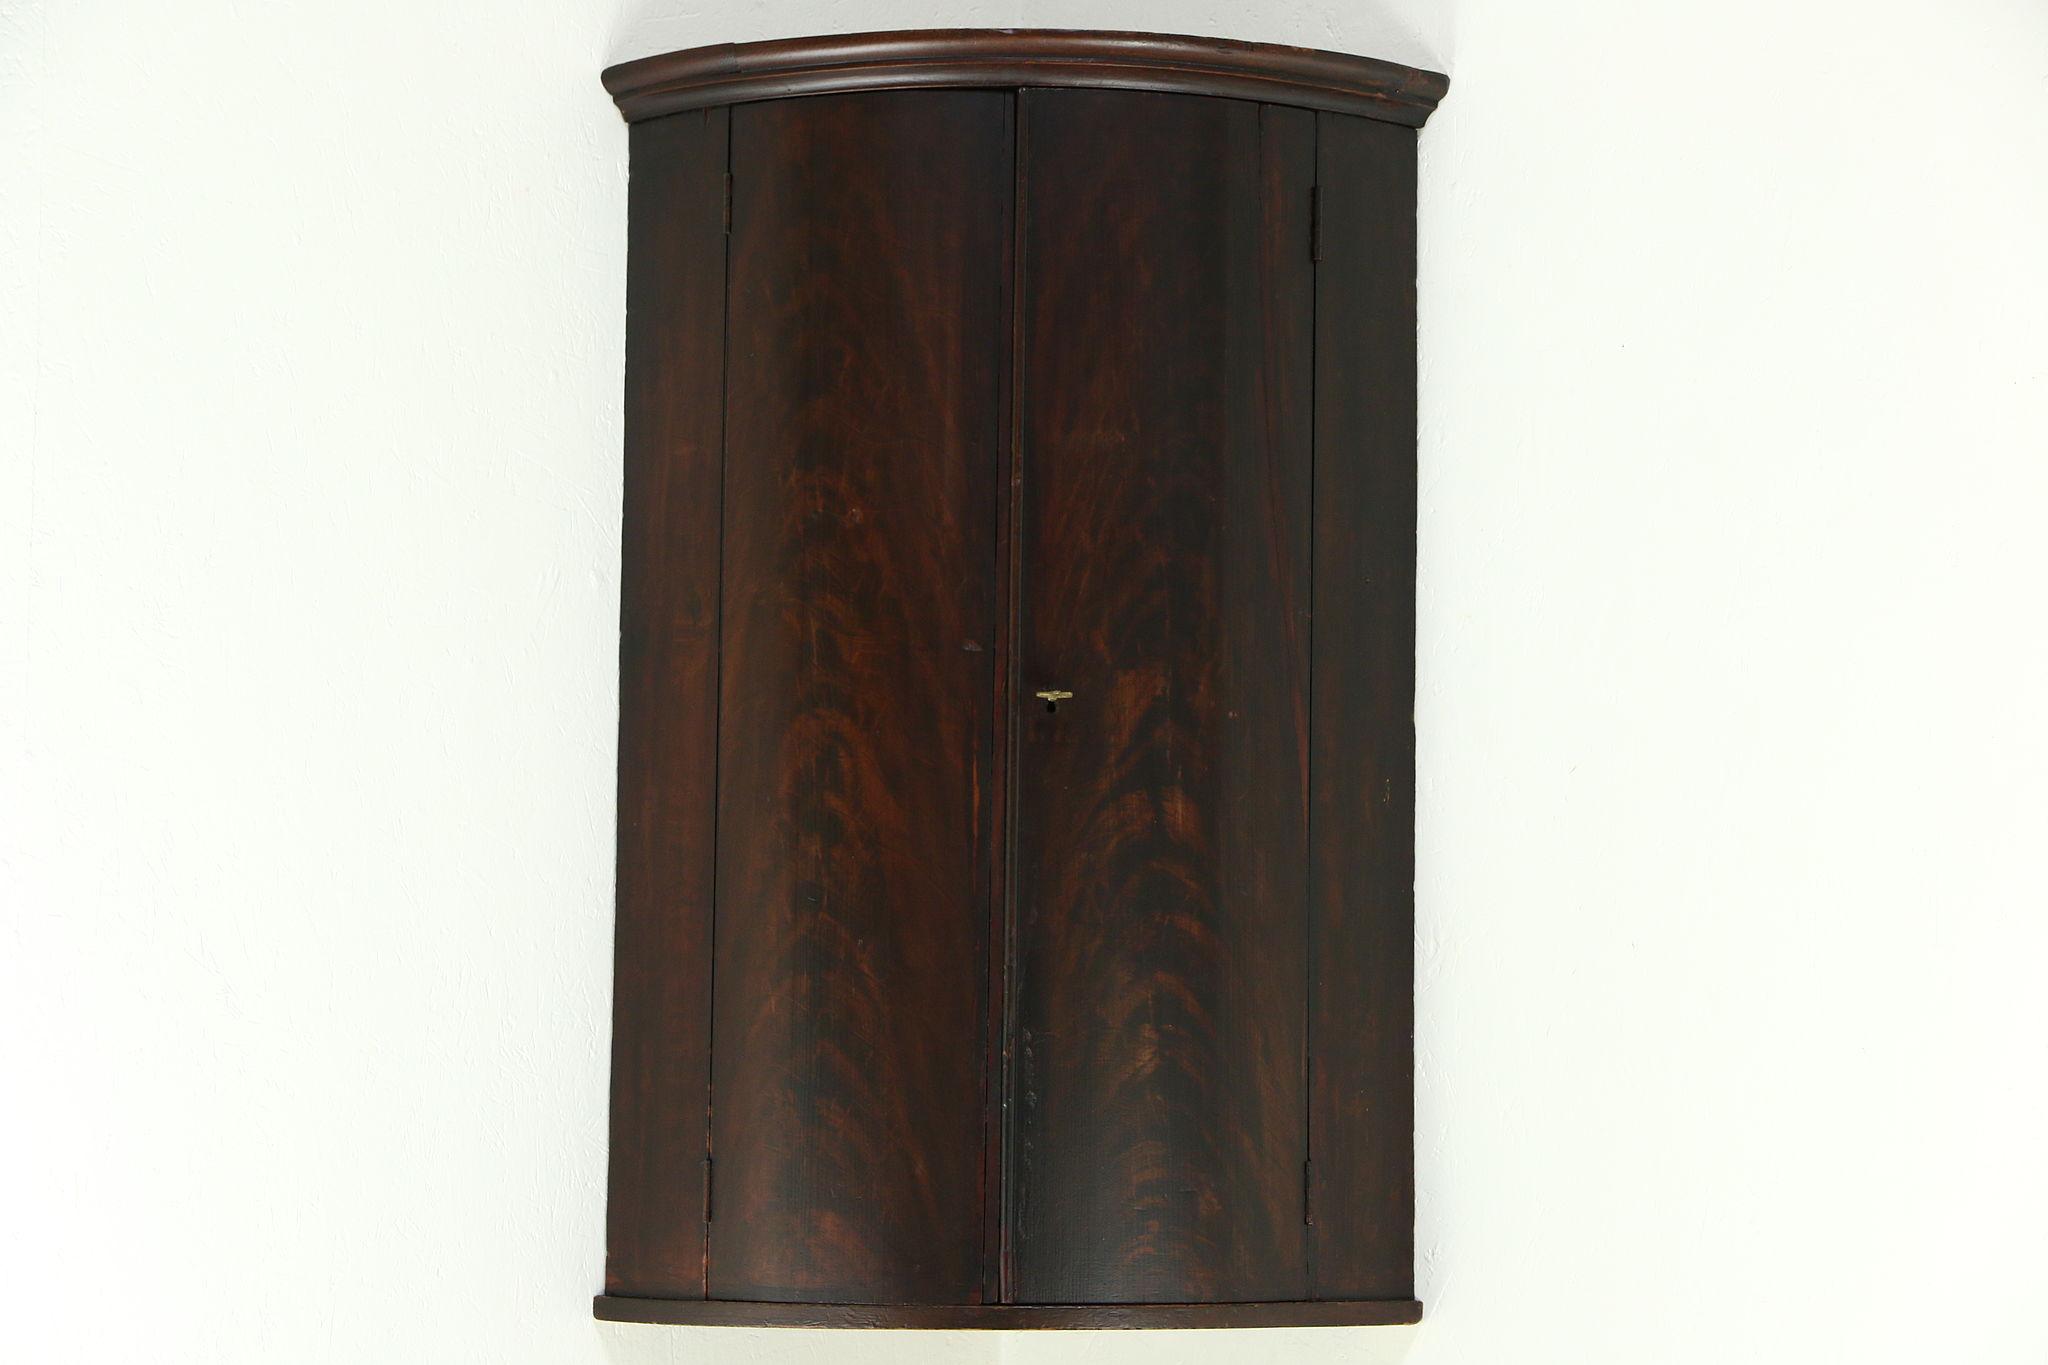 Corner Hanging Cabinet German 1800s Antique Painted Hanging Curved Corner Cabinet Or